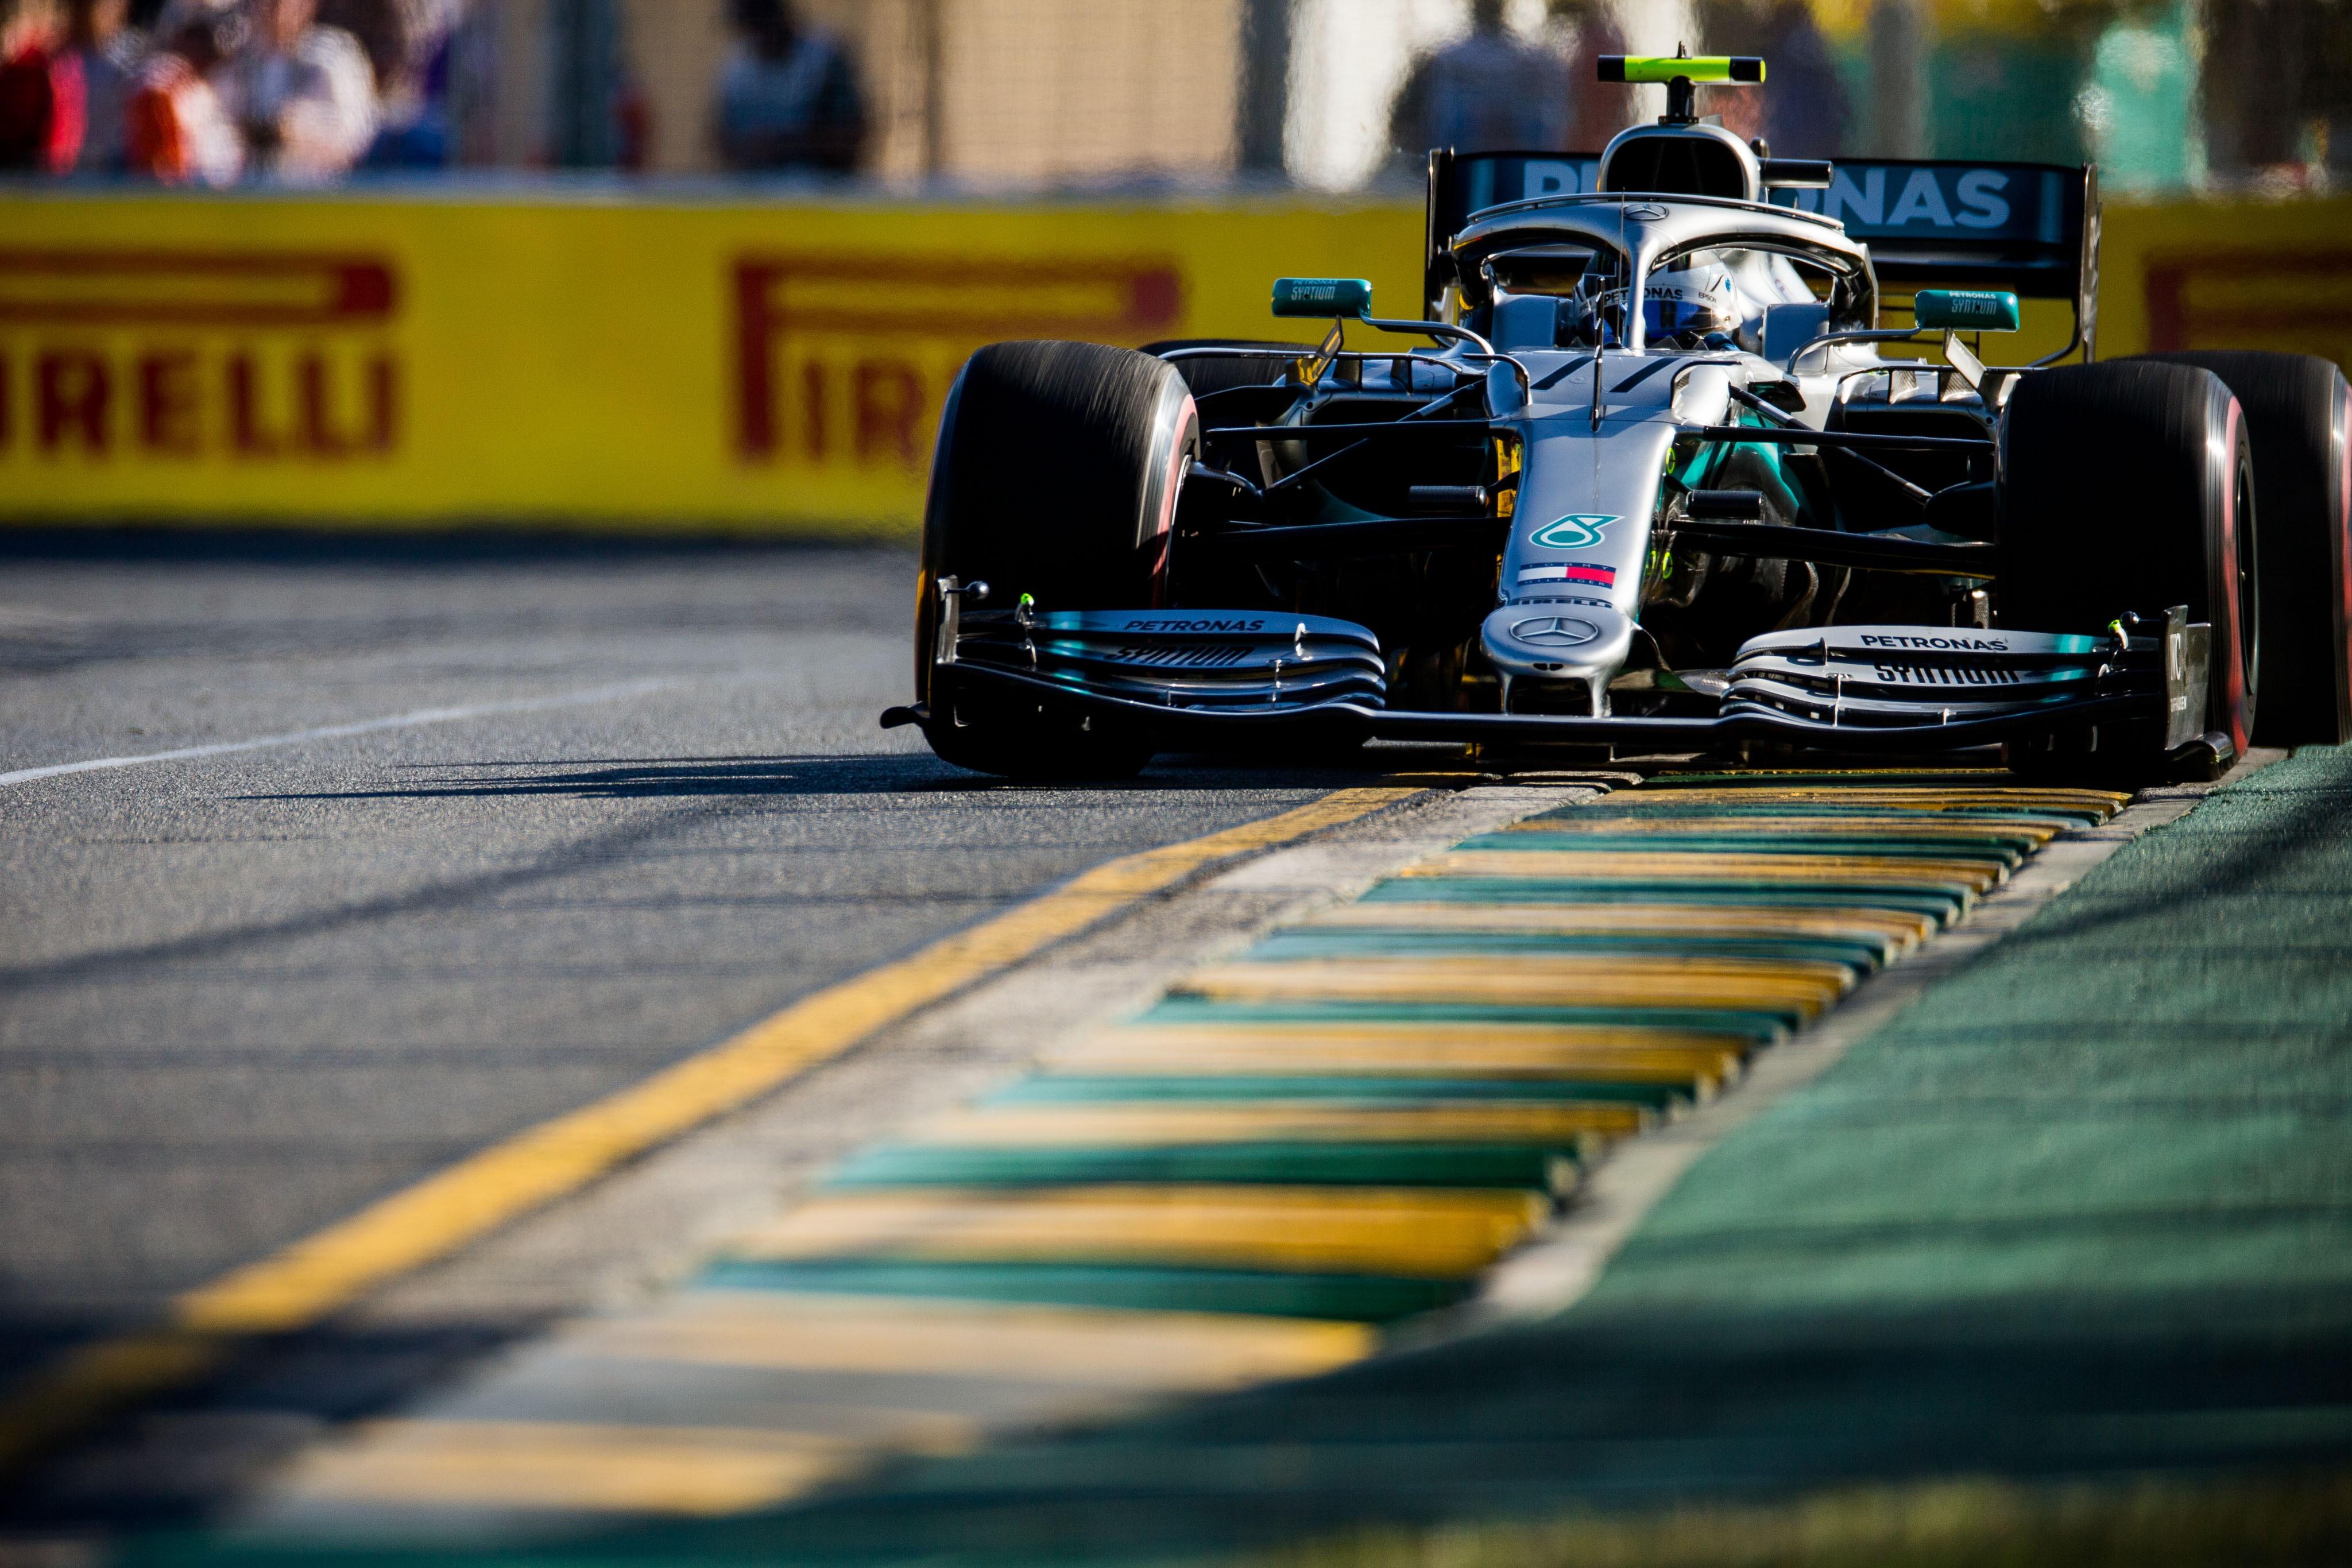 Valtteri Bottas (Mercedes) au Grand Prix d'Australie 2019